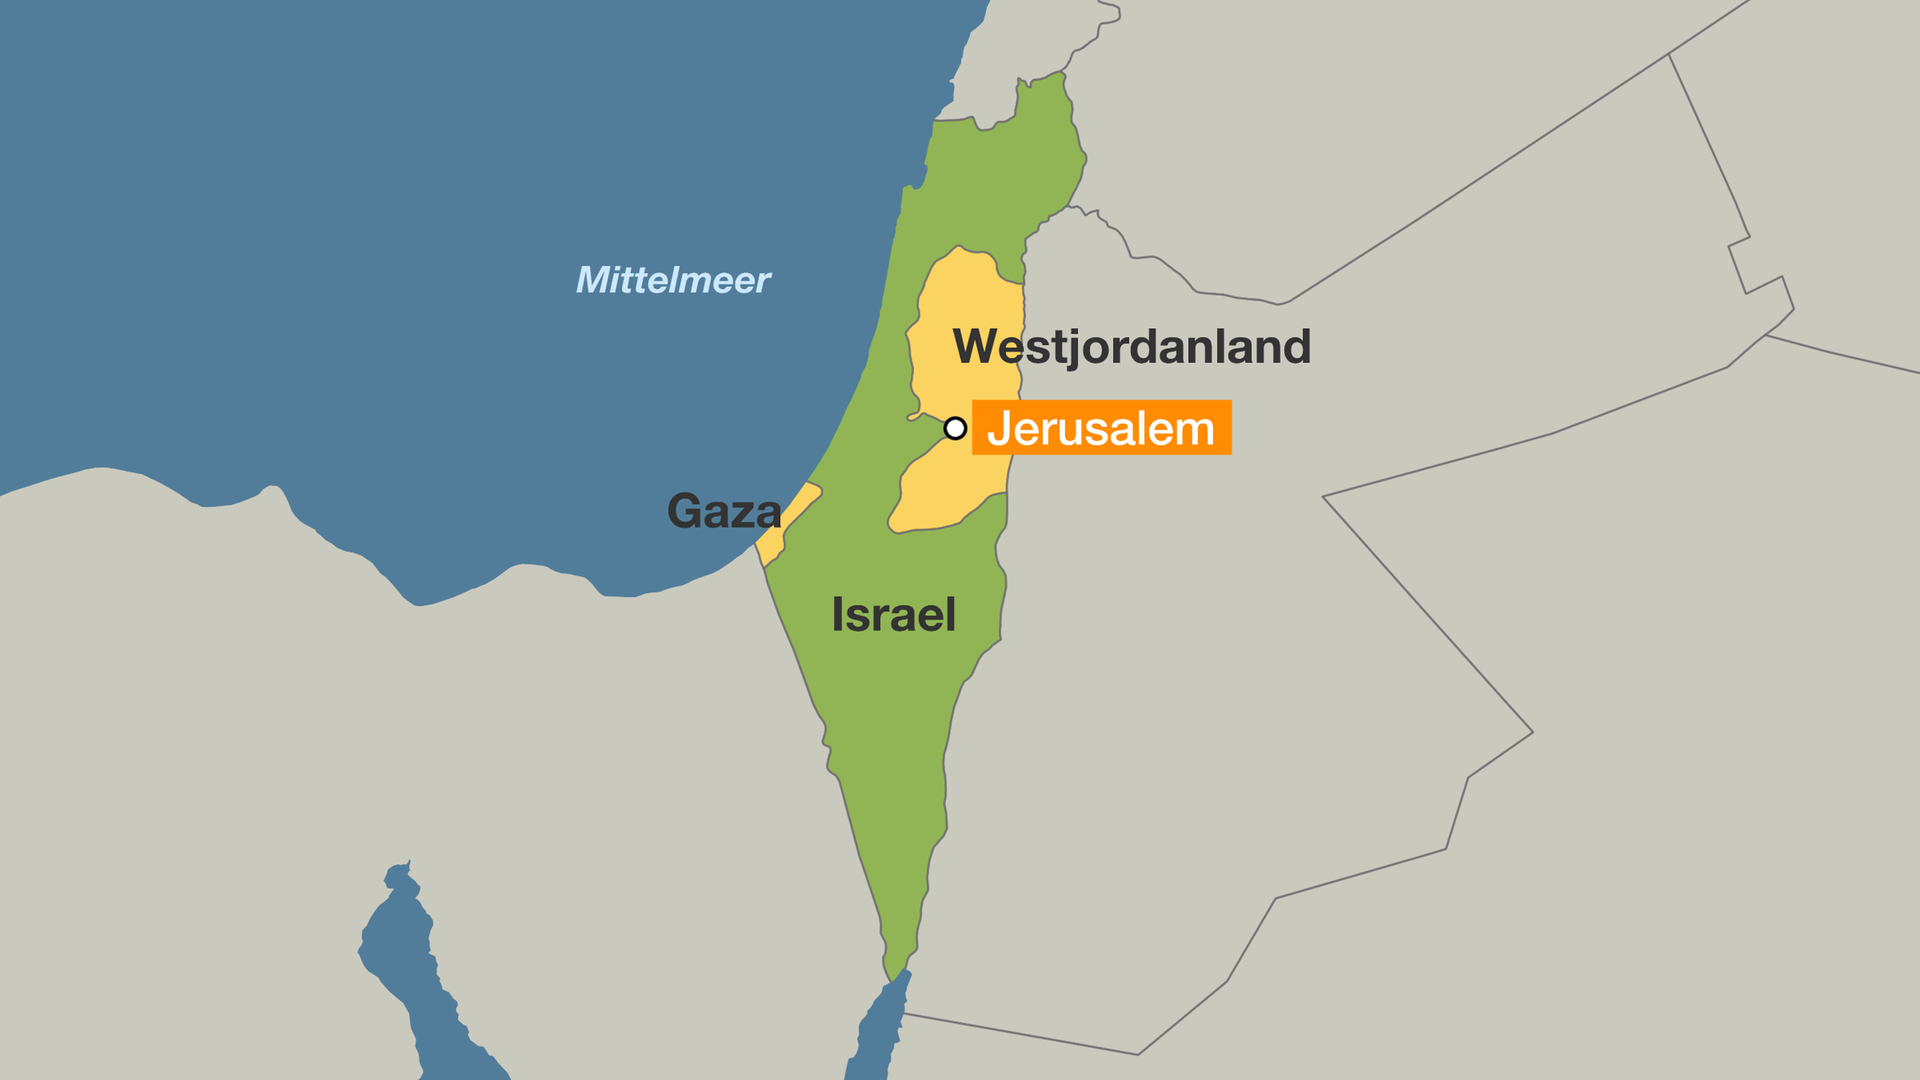 Jerusalem Karte Heute.Trumps Umstrittene Entscheidung Us Botschaft In Jerusalem